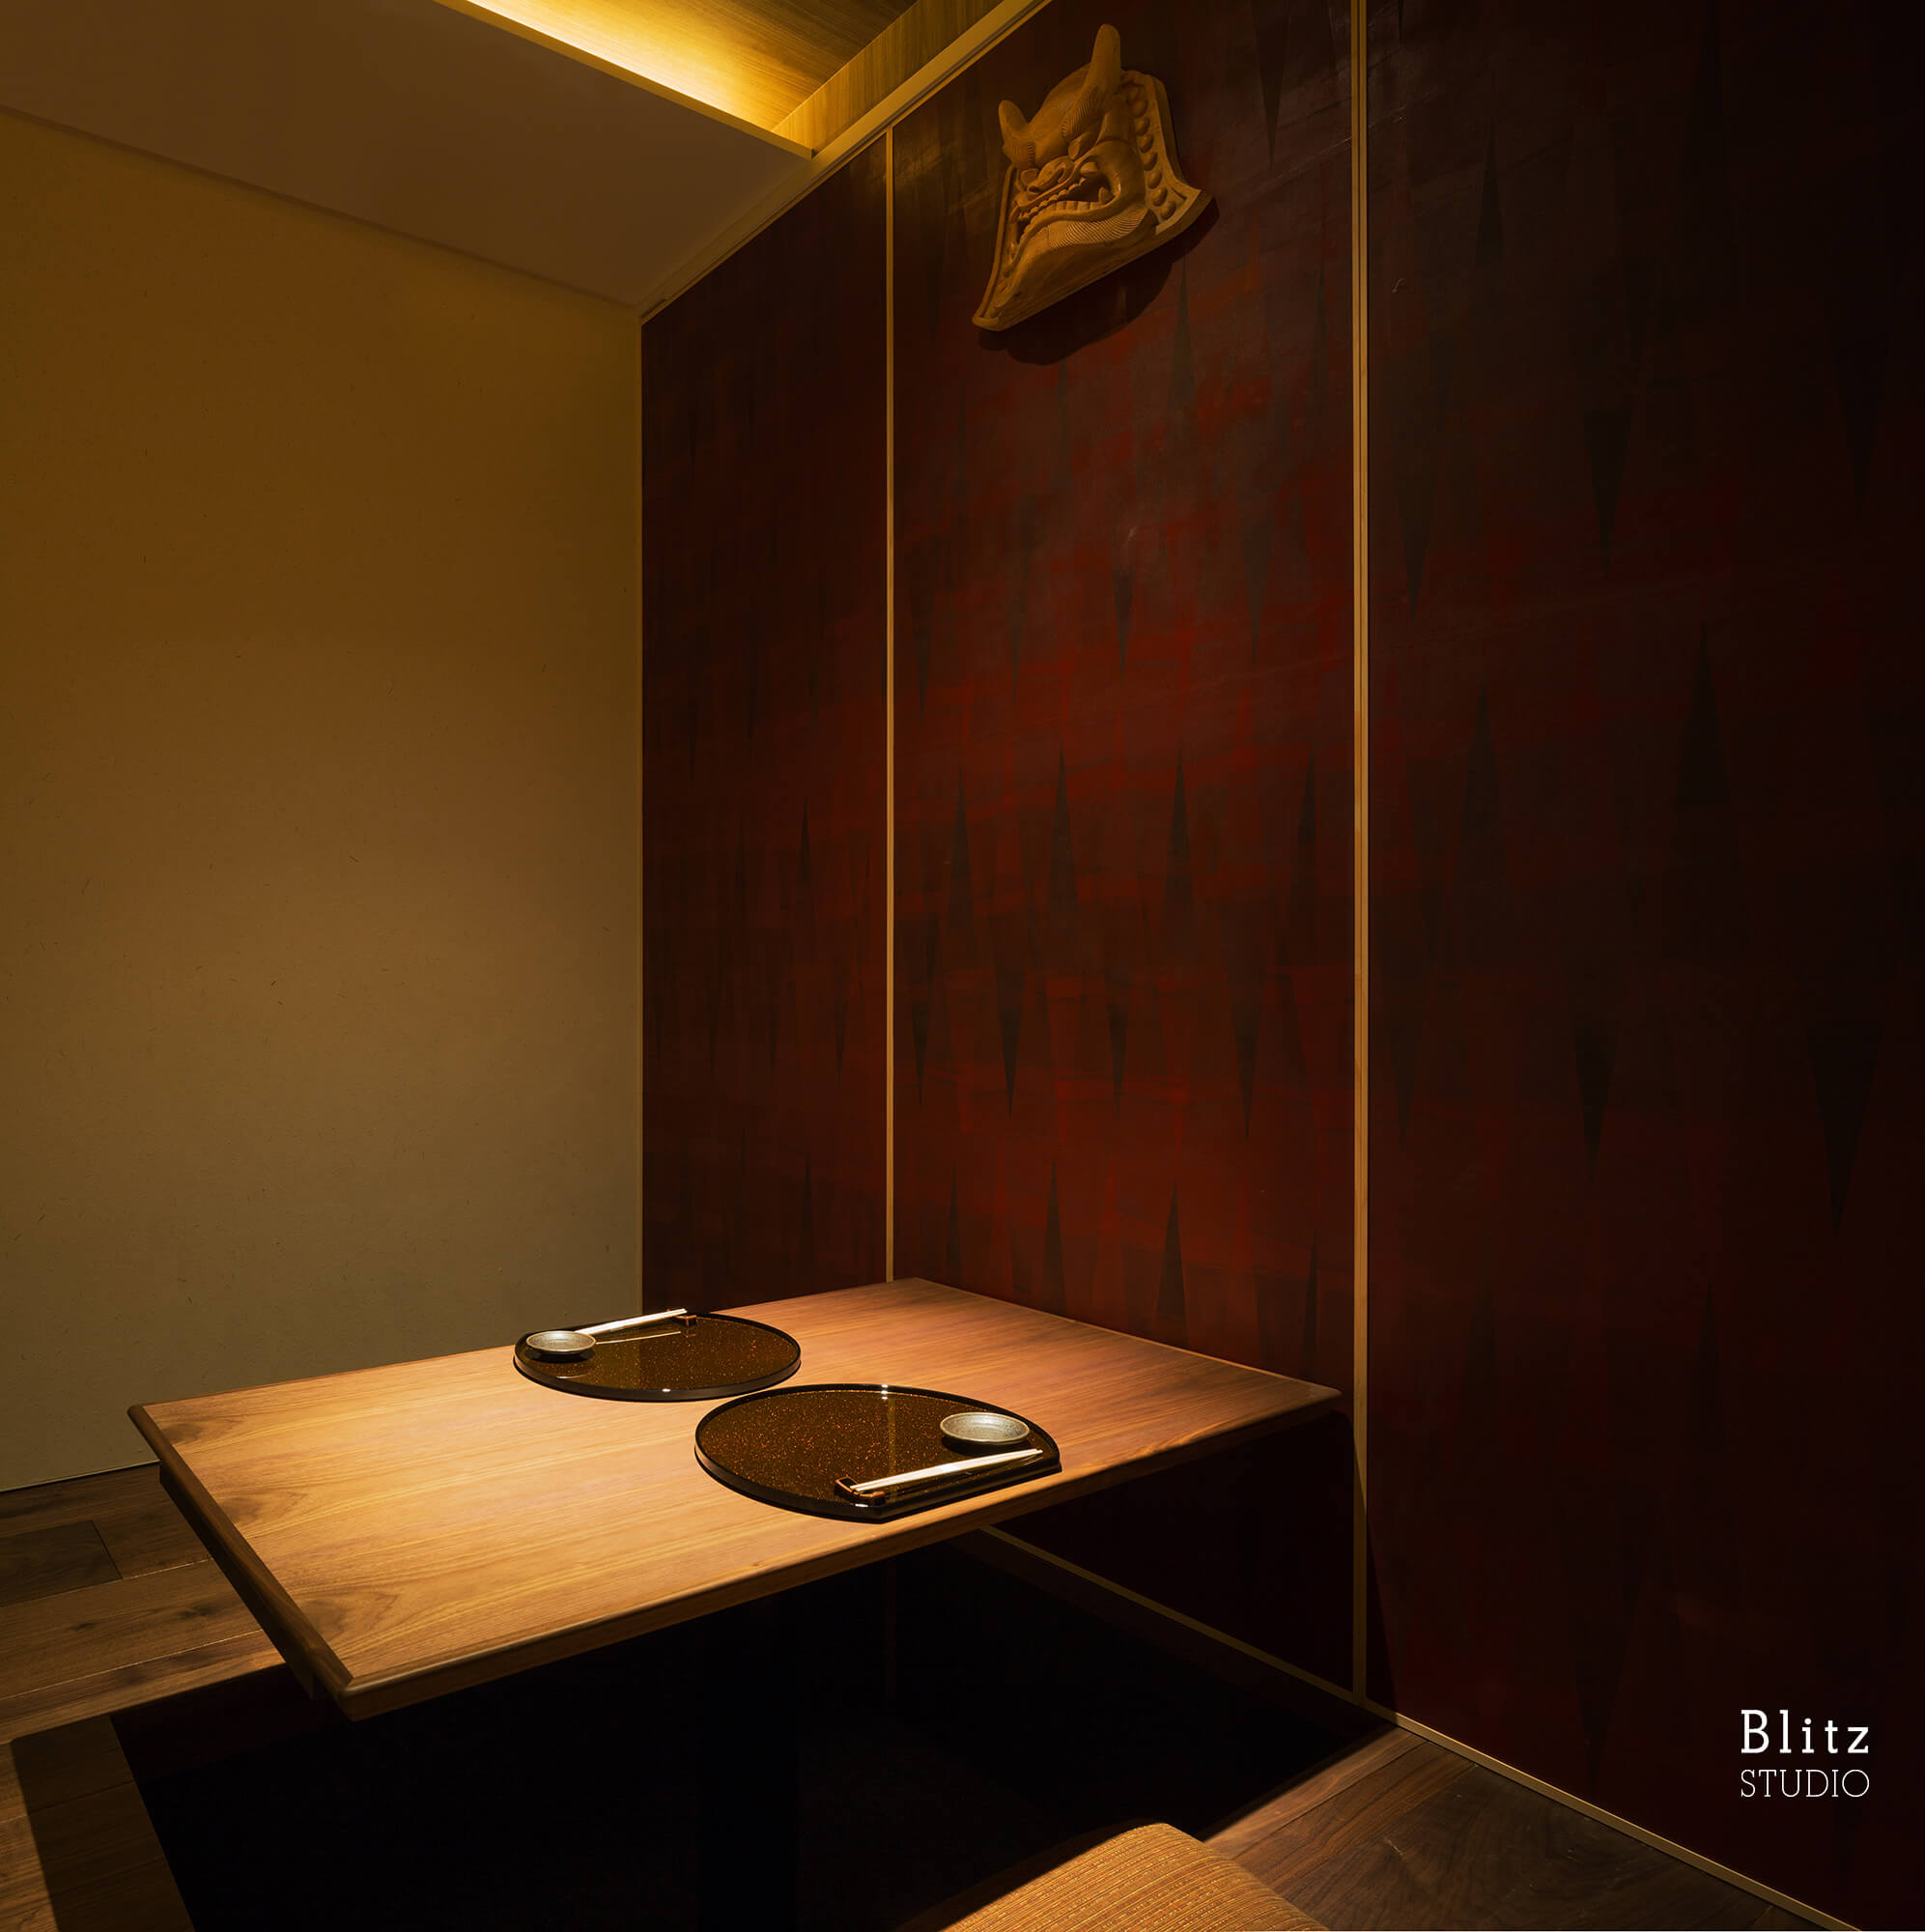 『Dining Bar Mond 2nd / 主水』建築写真・竣工写真・インテリア写真10